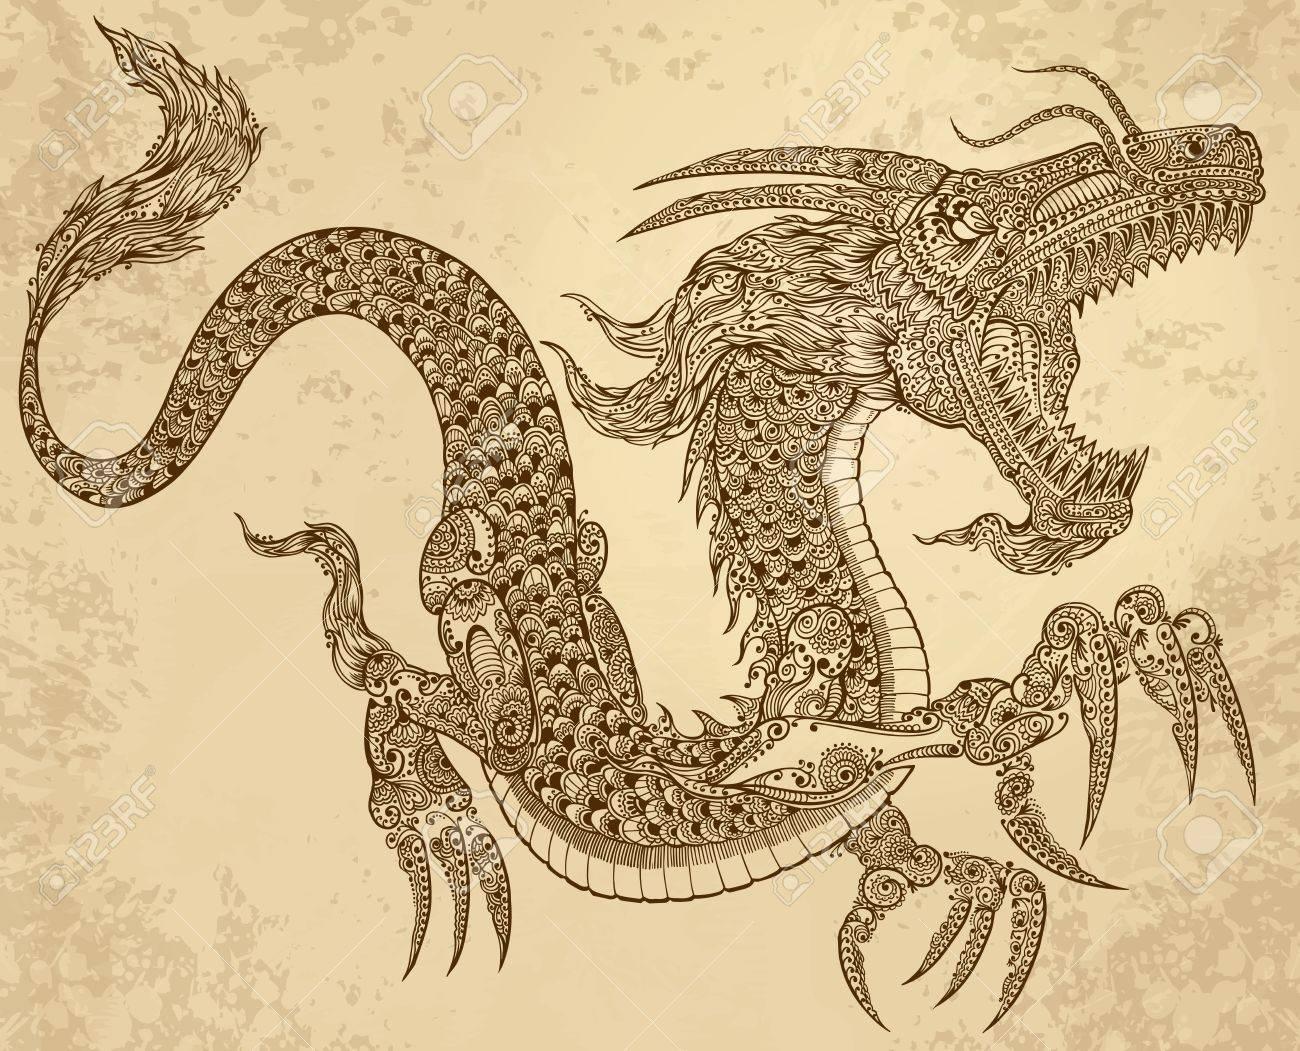 Henna Tattoo Dragon Doodle Sketch Tribal grunge Vector Illustration Art - 14065127